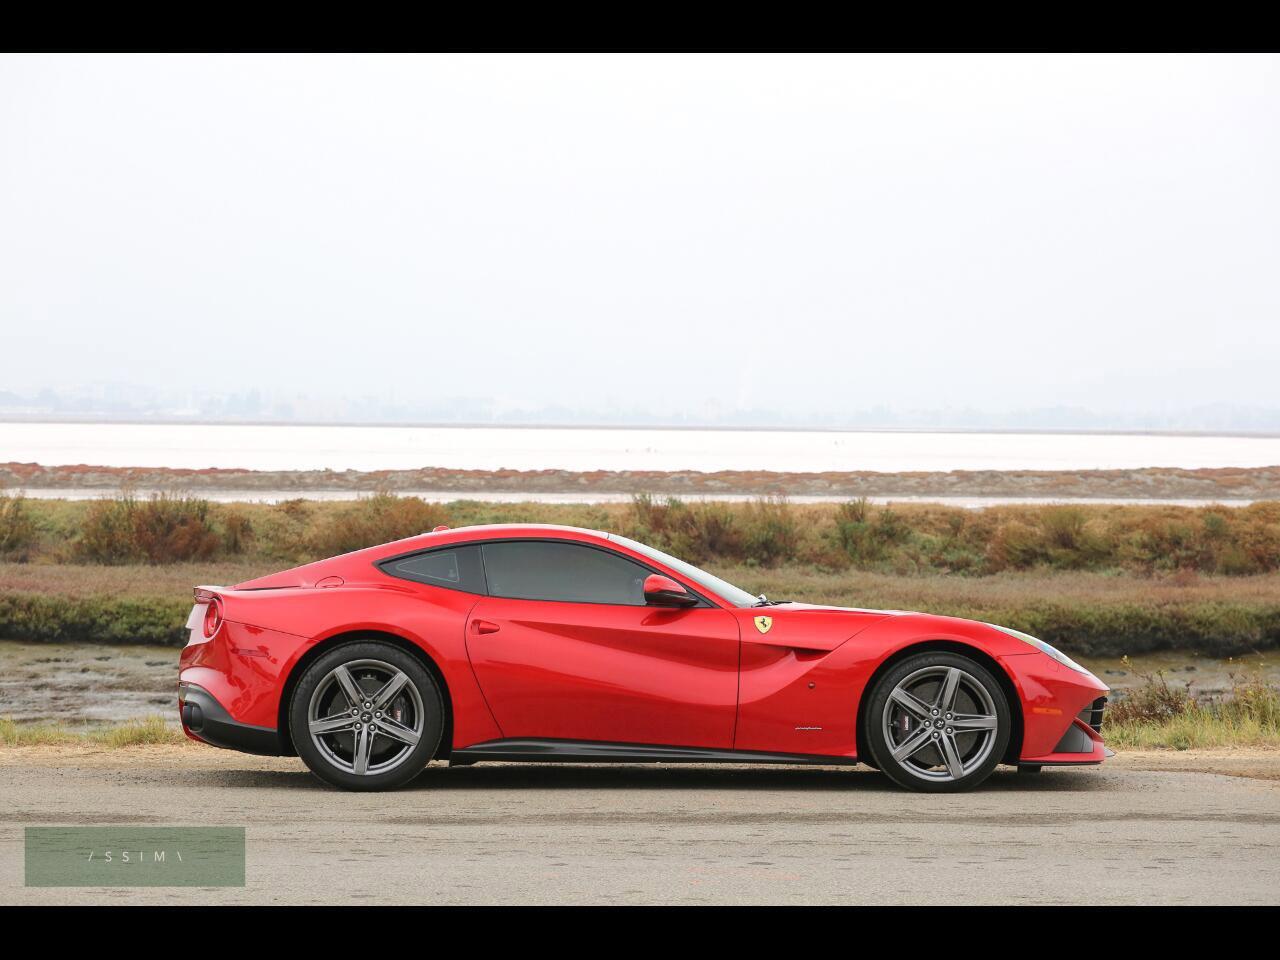 2013 Ferrari F12 Berlinetta  image